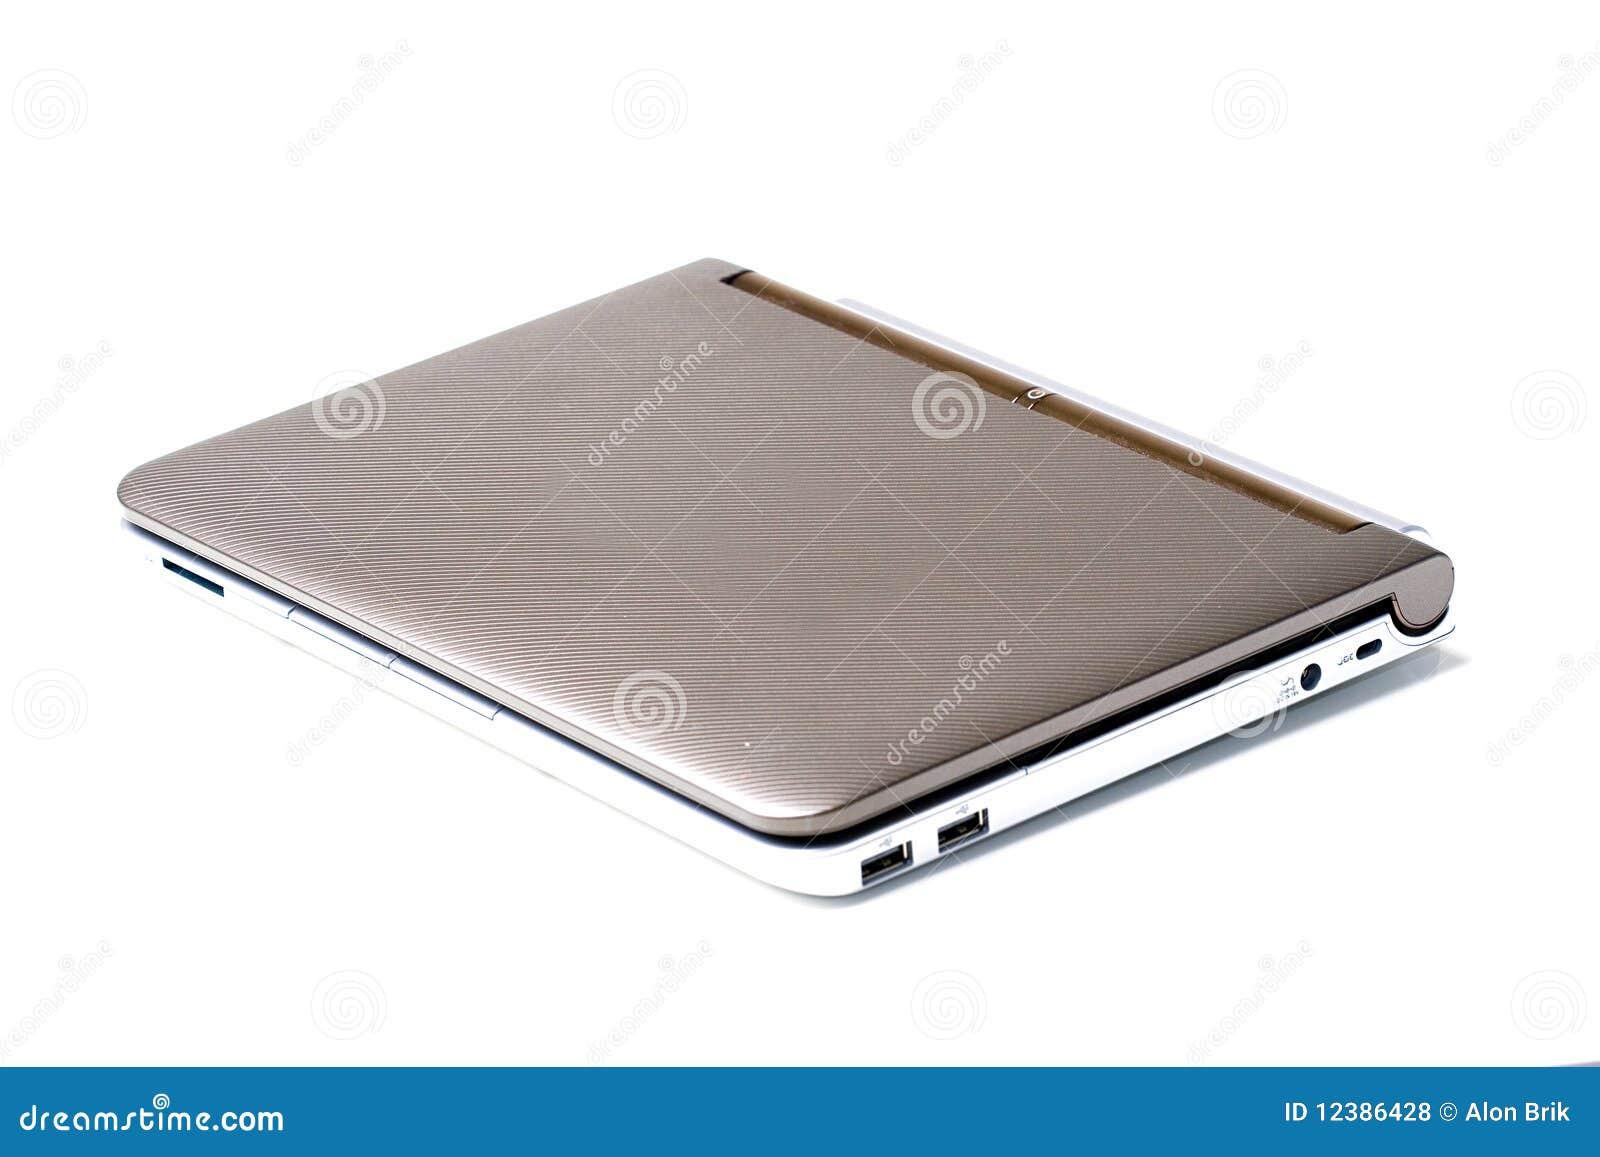 kleiner laptop notebook computer geschlossen getrennt lizenzfreie stockfotos bild 12386428. Black Bedroom Furniture Sets. Home Design Ideas